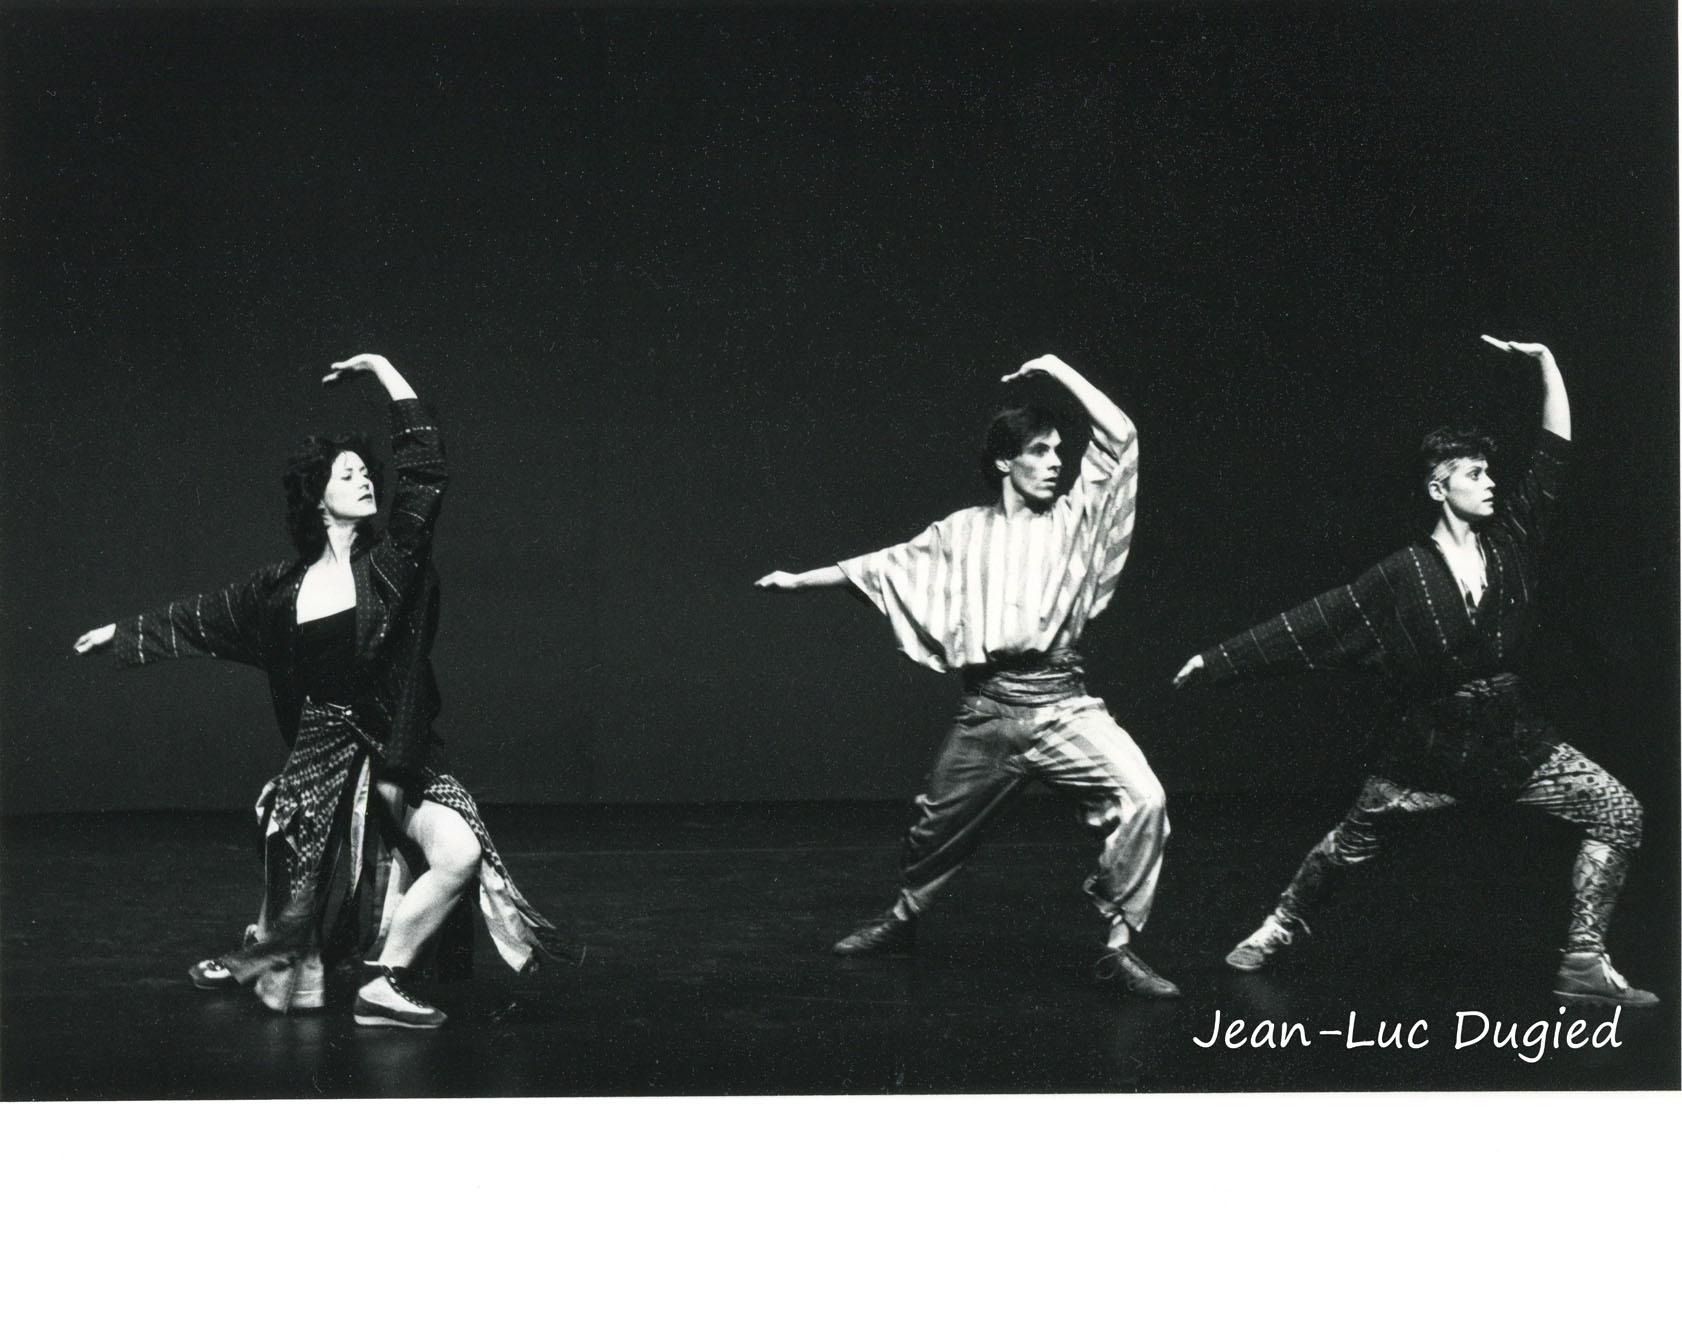 16 Dugied Fabrice - les zonards célestes - Catherine Lika, Bernard Collin et Geneviève Mazin - 1987